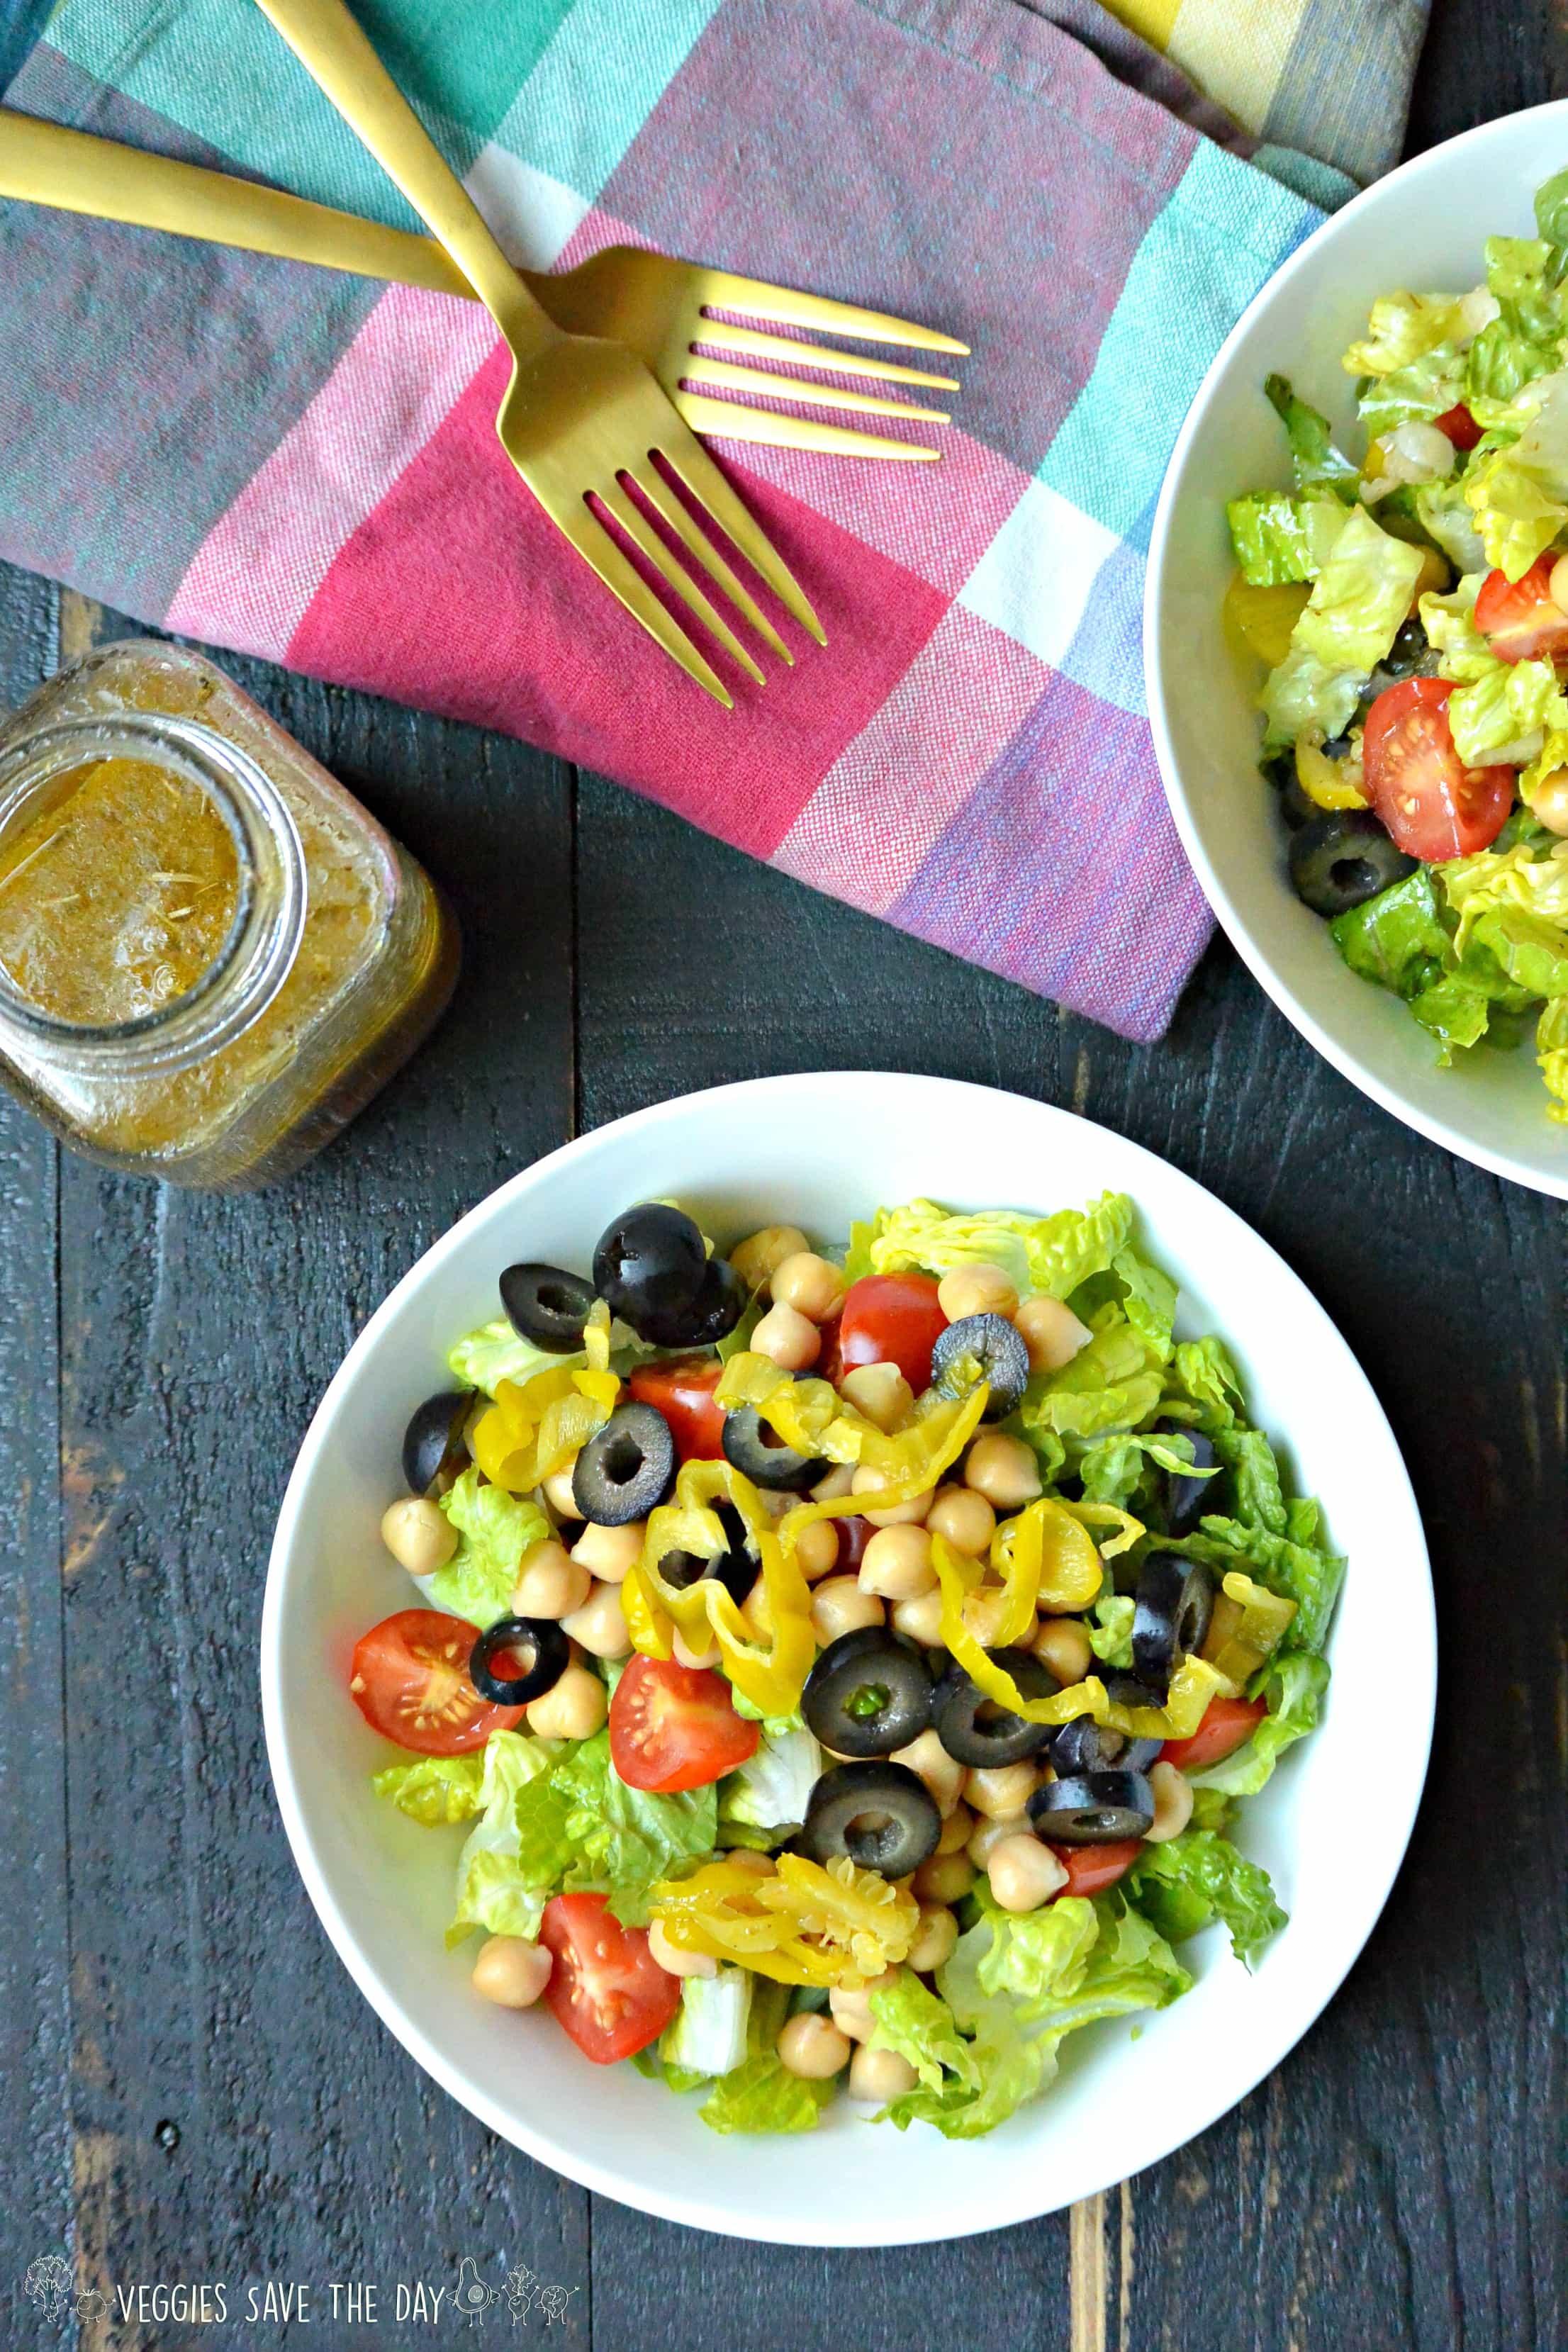 Gluten-Free Vegan Recipes Italian chopped salad